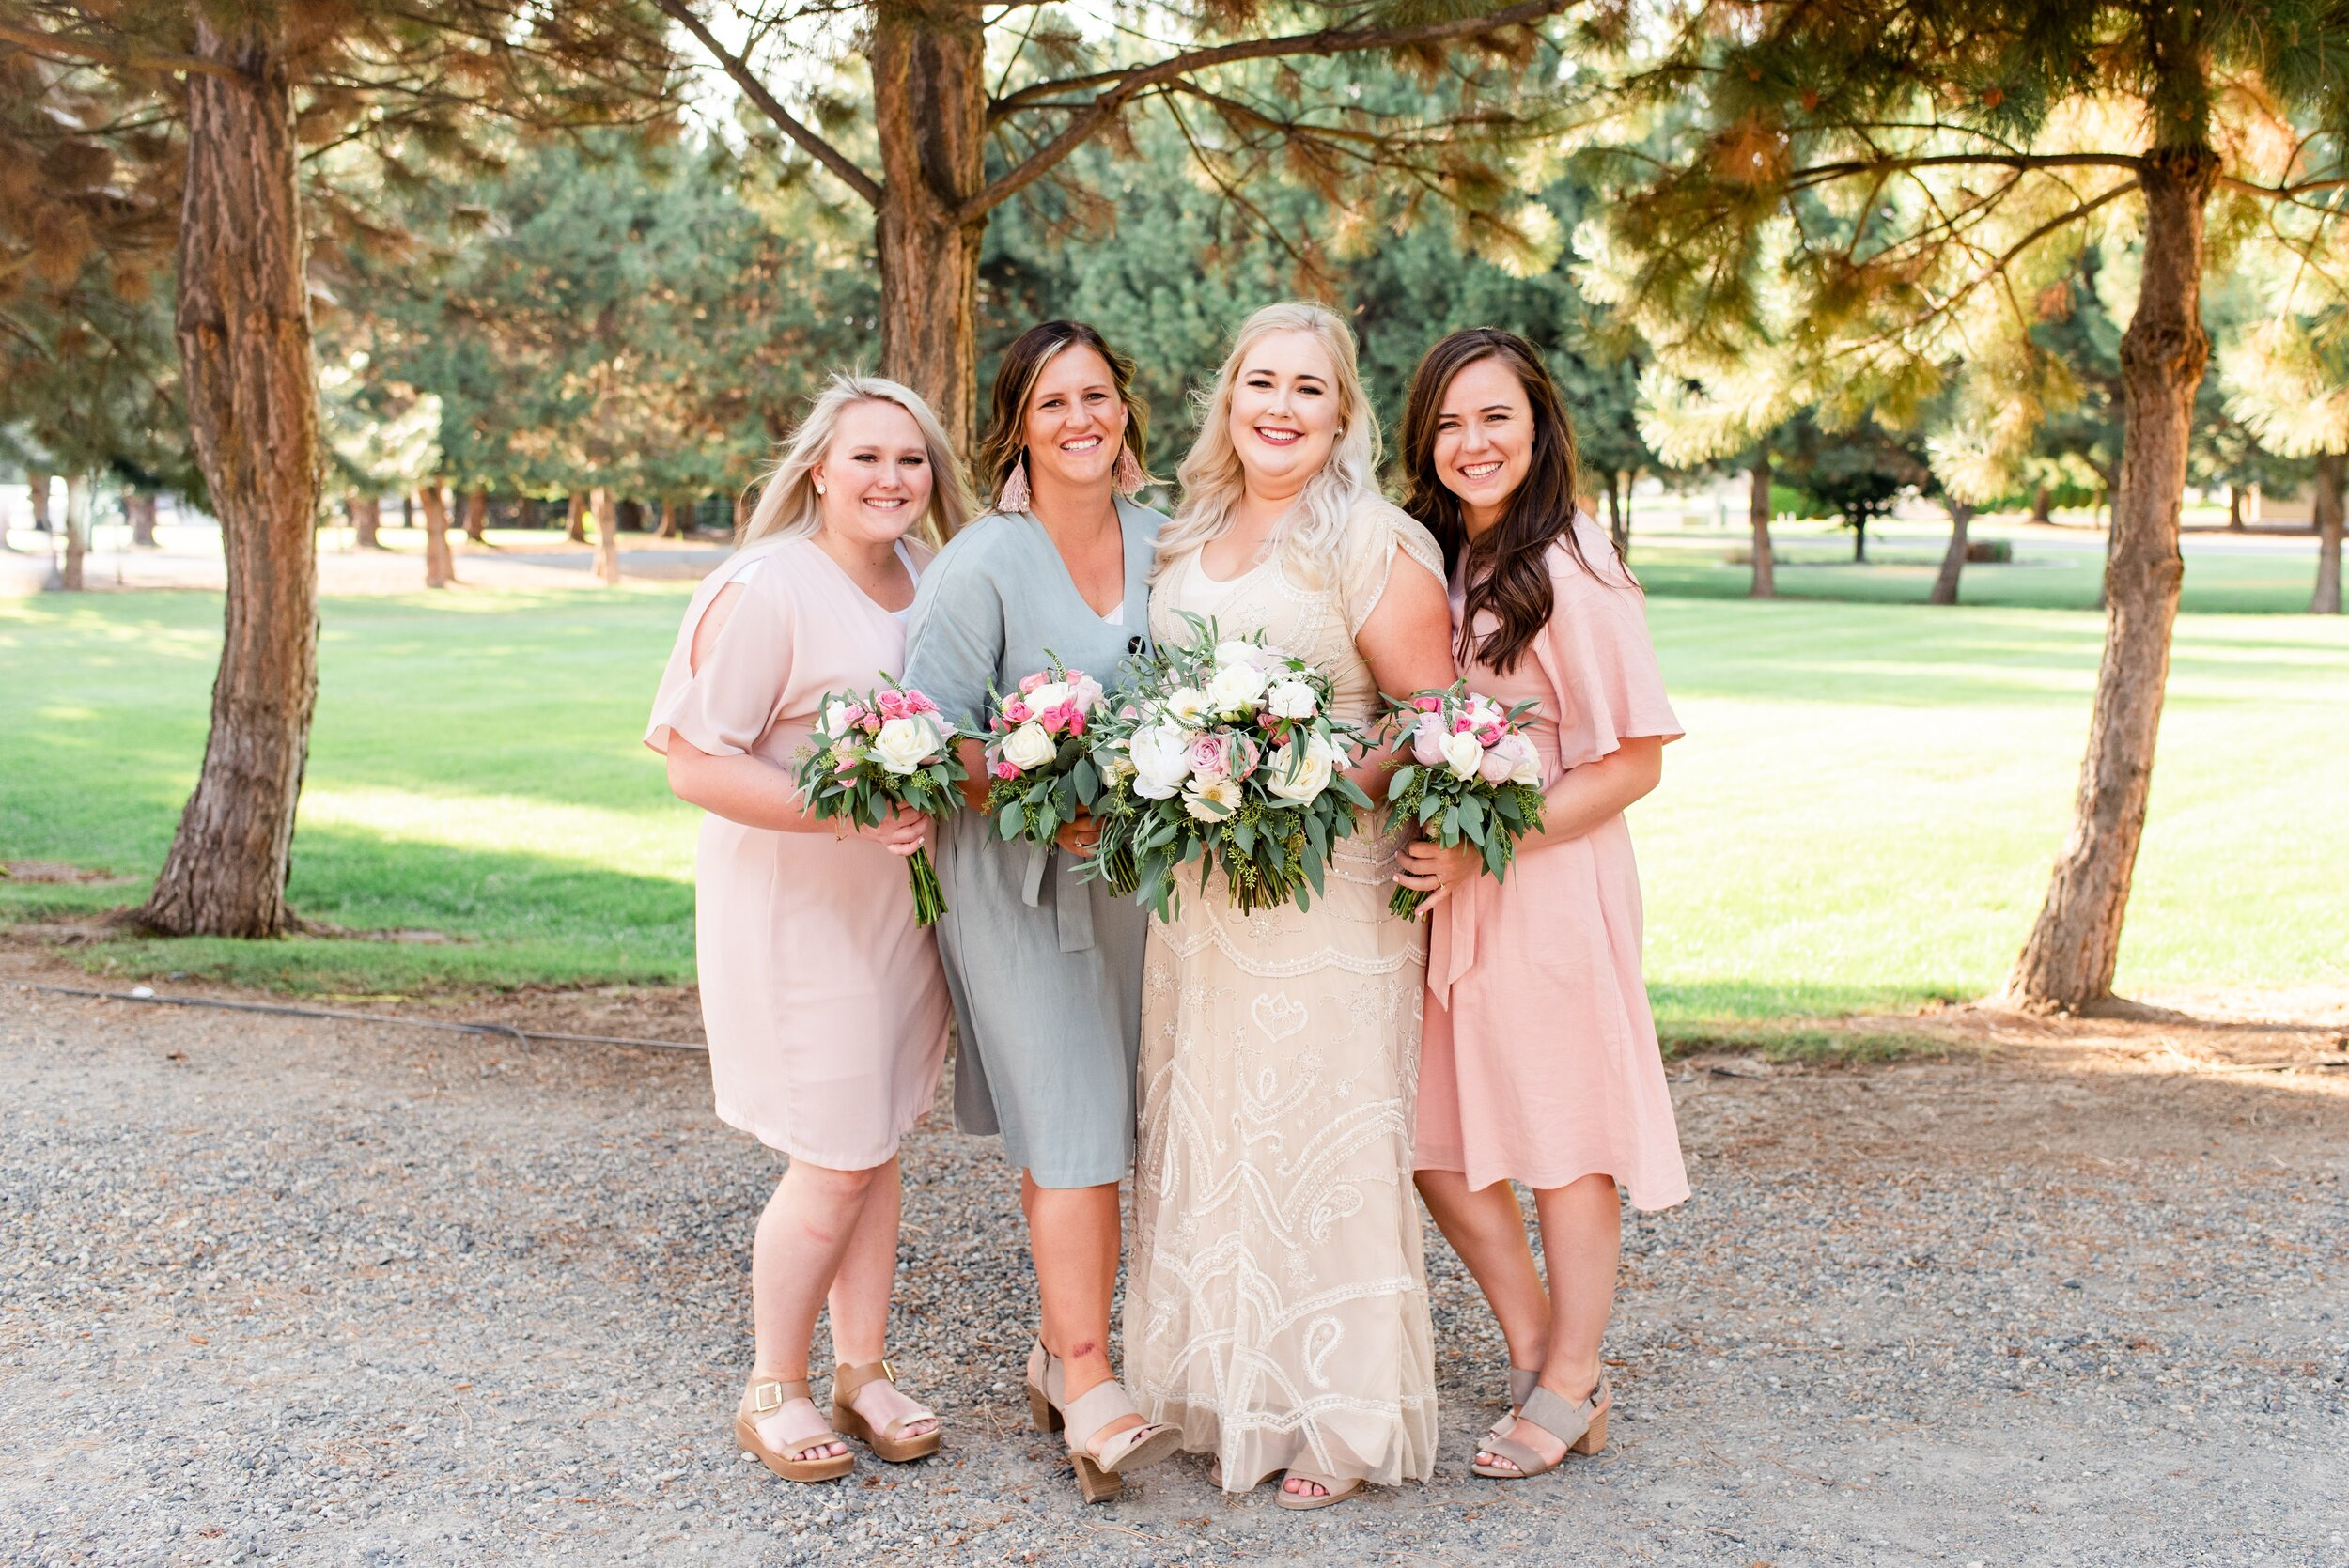 Bride & Bridesmaids - Tri Cities Wedding Photographer - Morgan Tayler Photo & Design - Tri Cities Washington Backyard Wedding